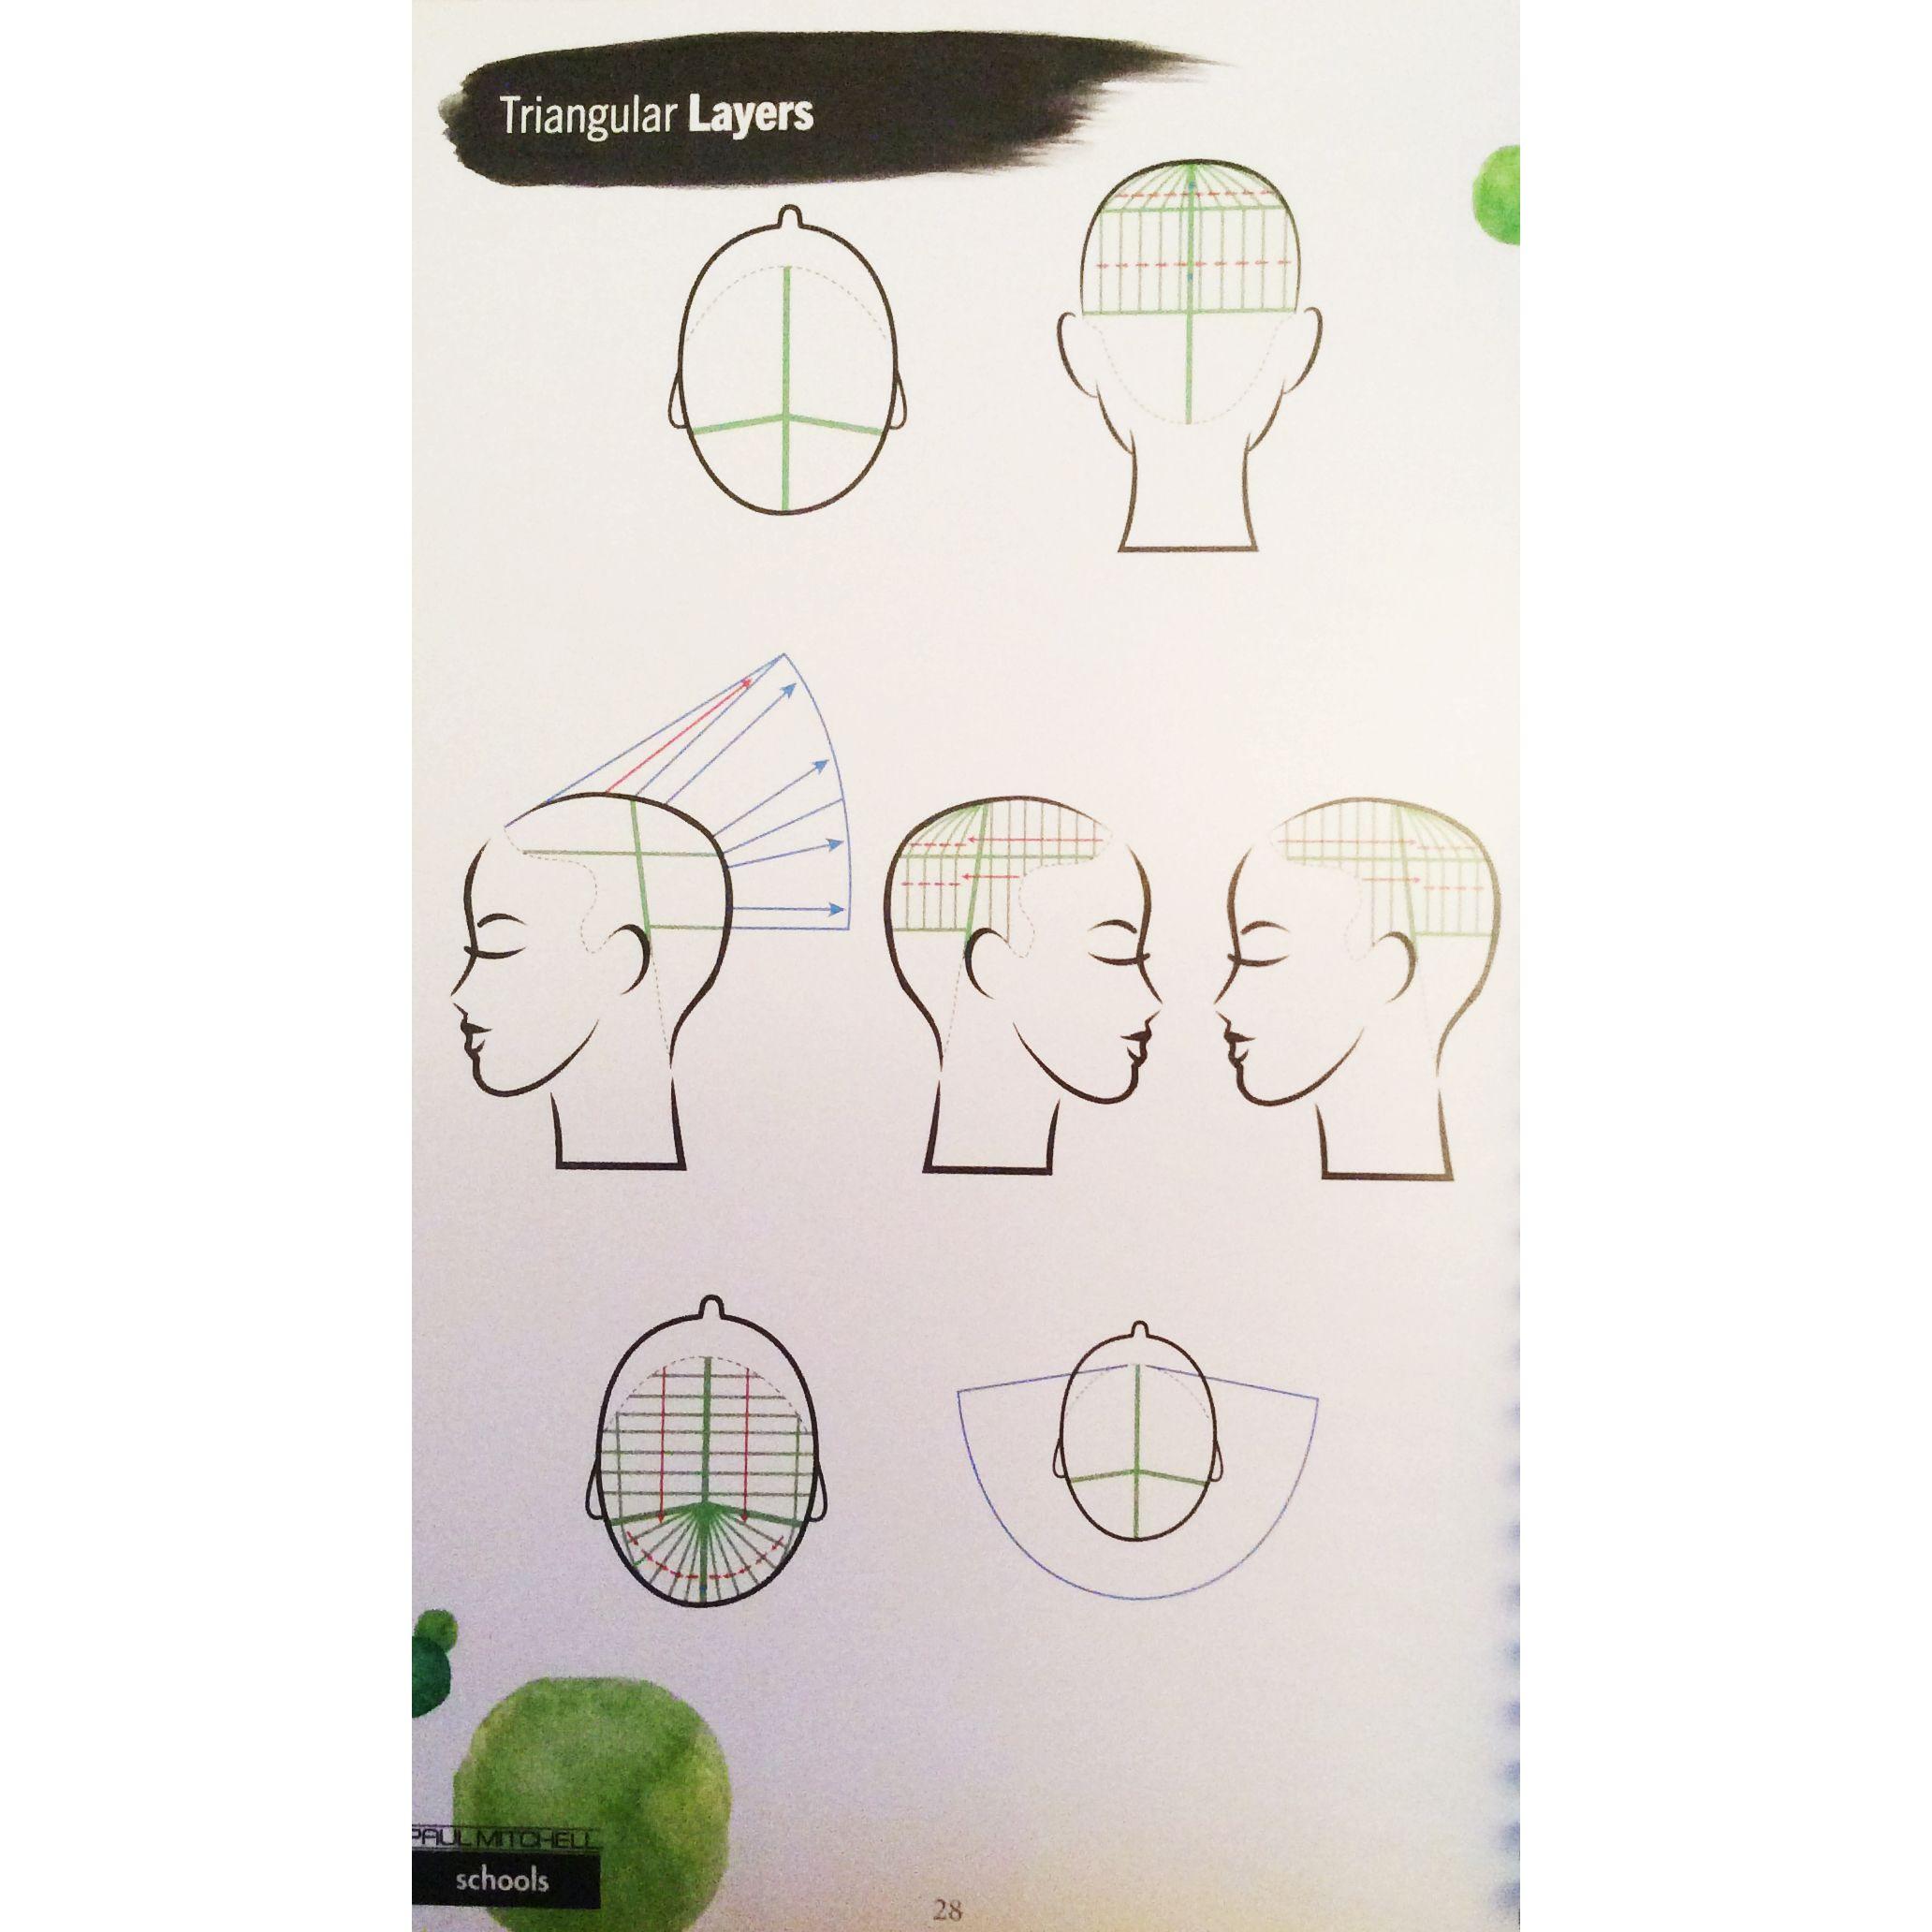 90 Degree Diagram Volkswagen T5 Wiring Diagrams Triangular Layer Hair Pinterest Cuts